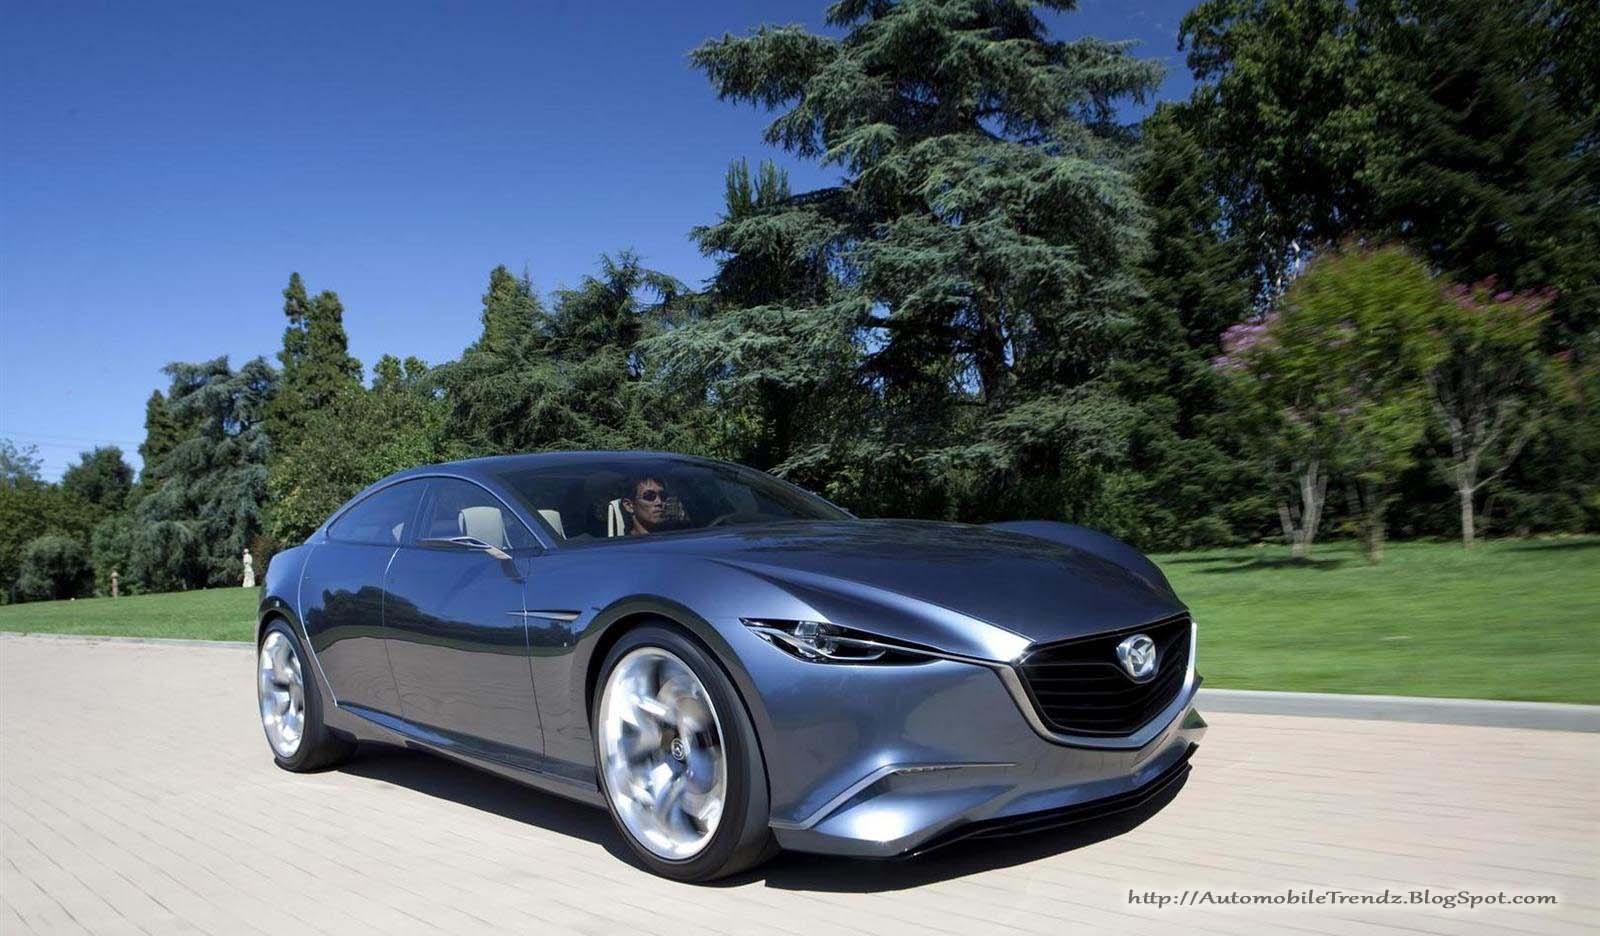 automobile trendz 2013 mazda mx 5 miata. Black Bedroom Furniture Sets. Home Design Ideas